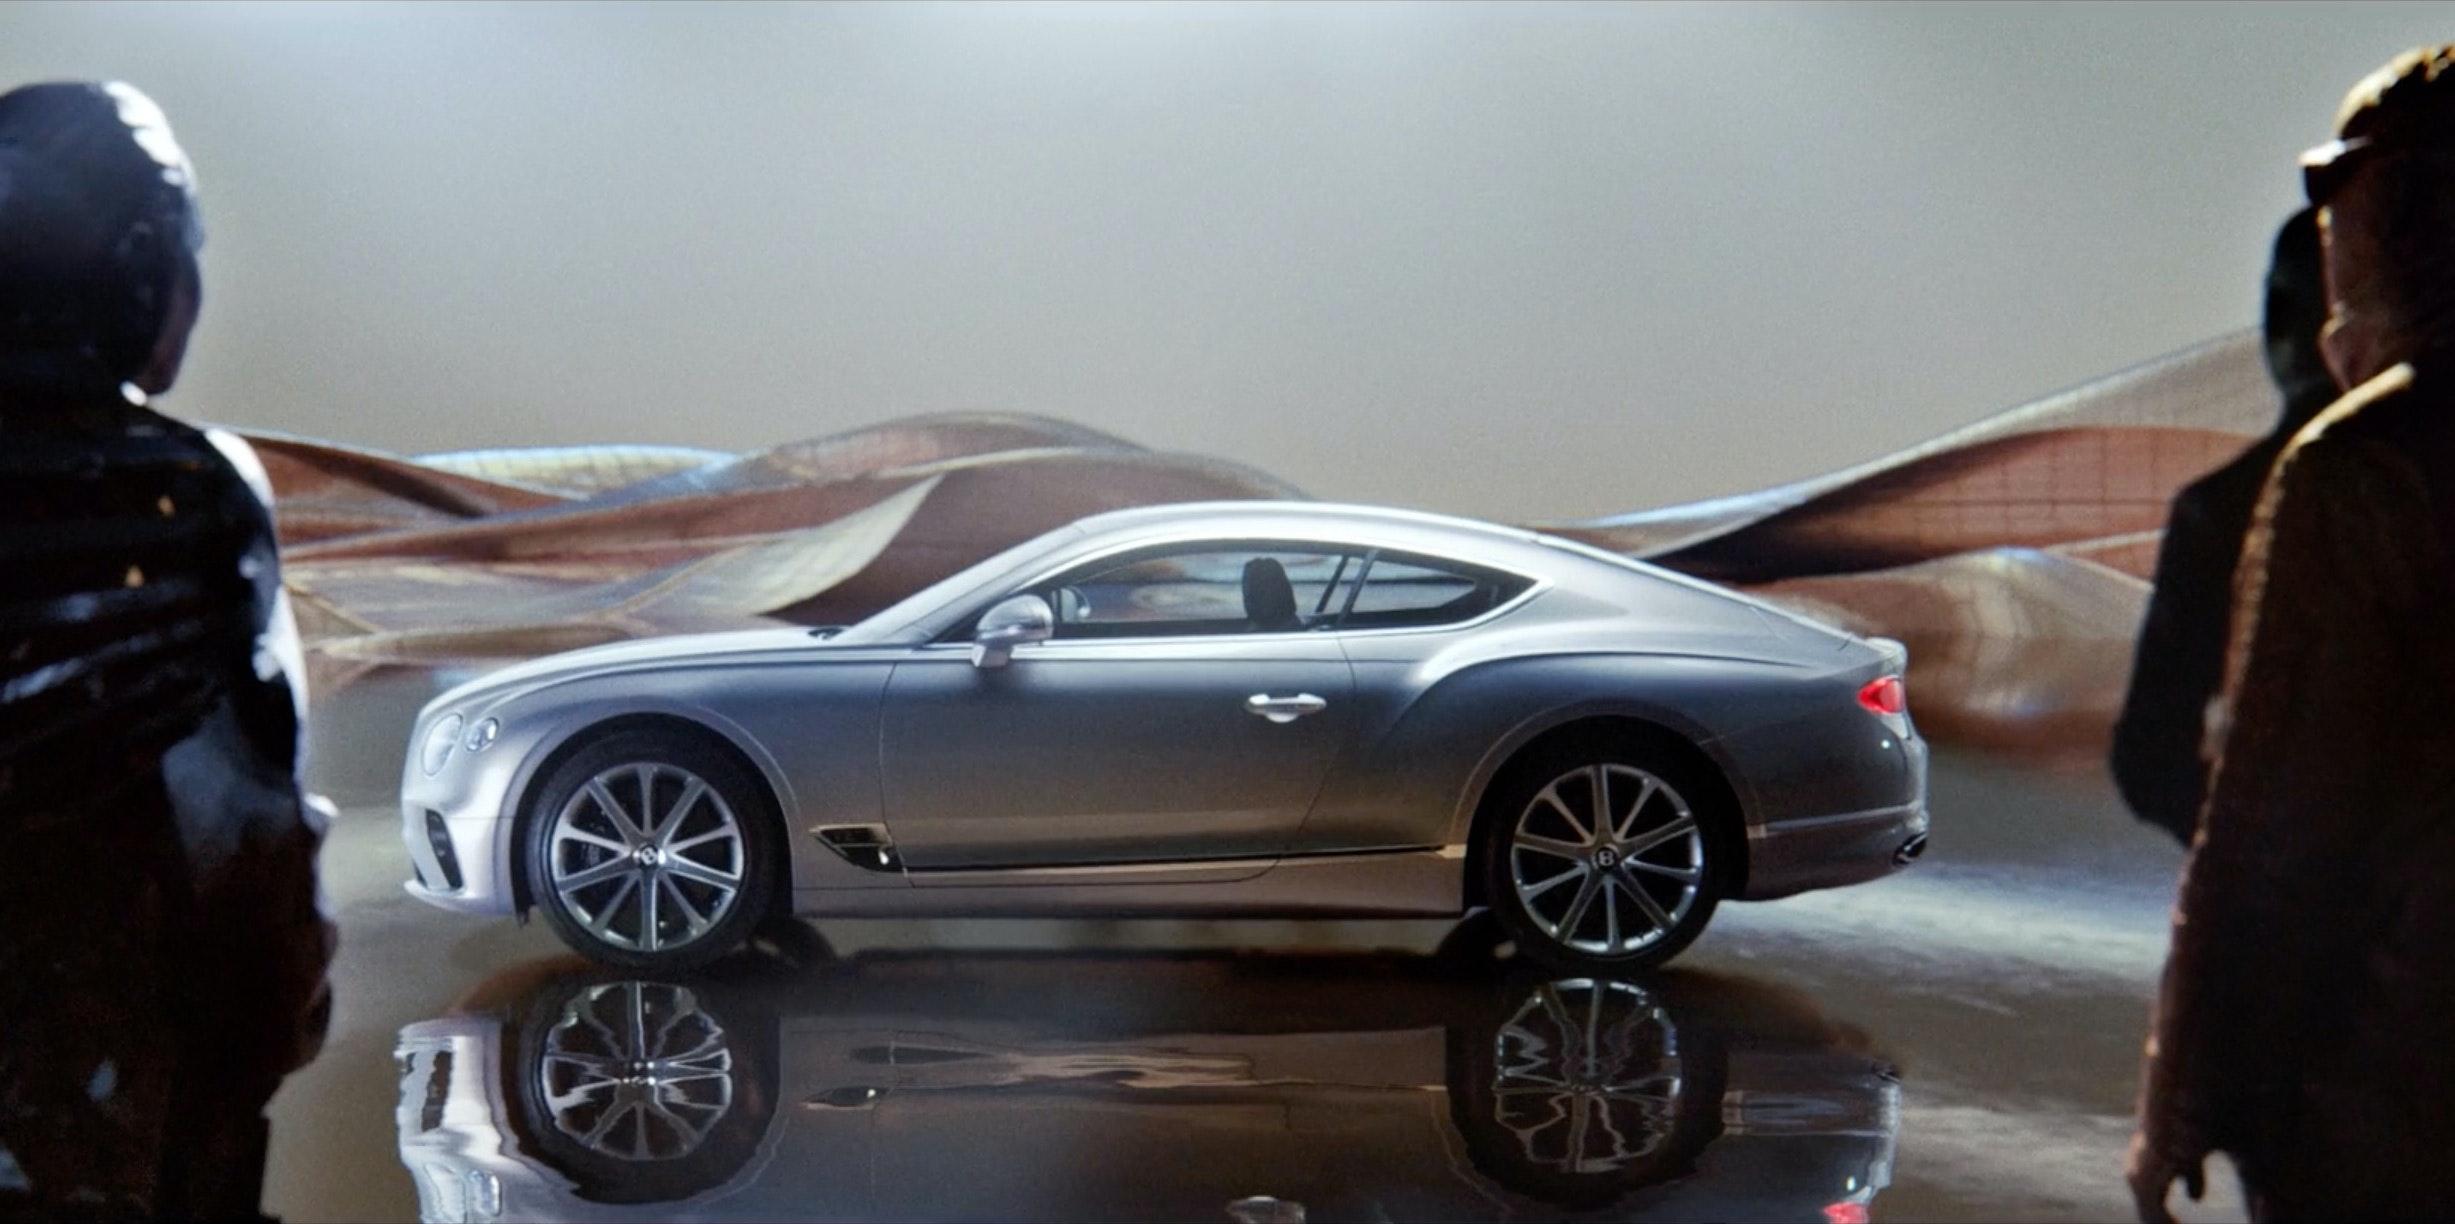 Bentley   Together We Are Extraordinary